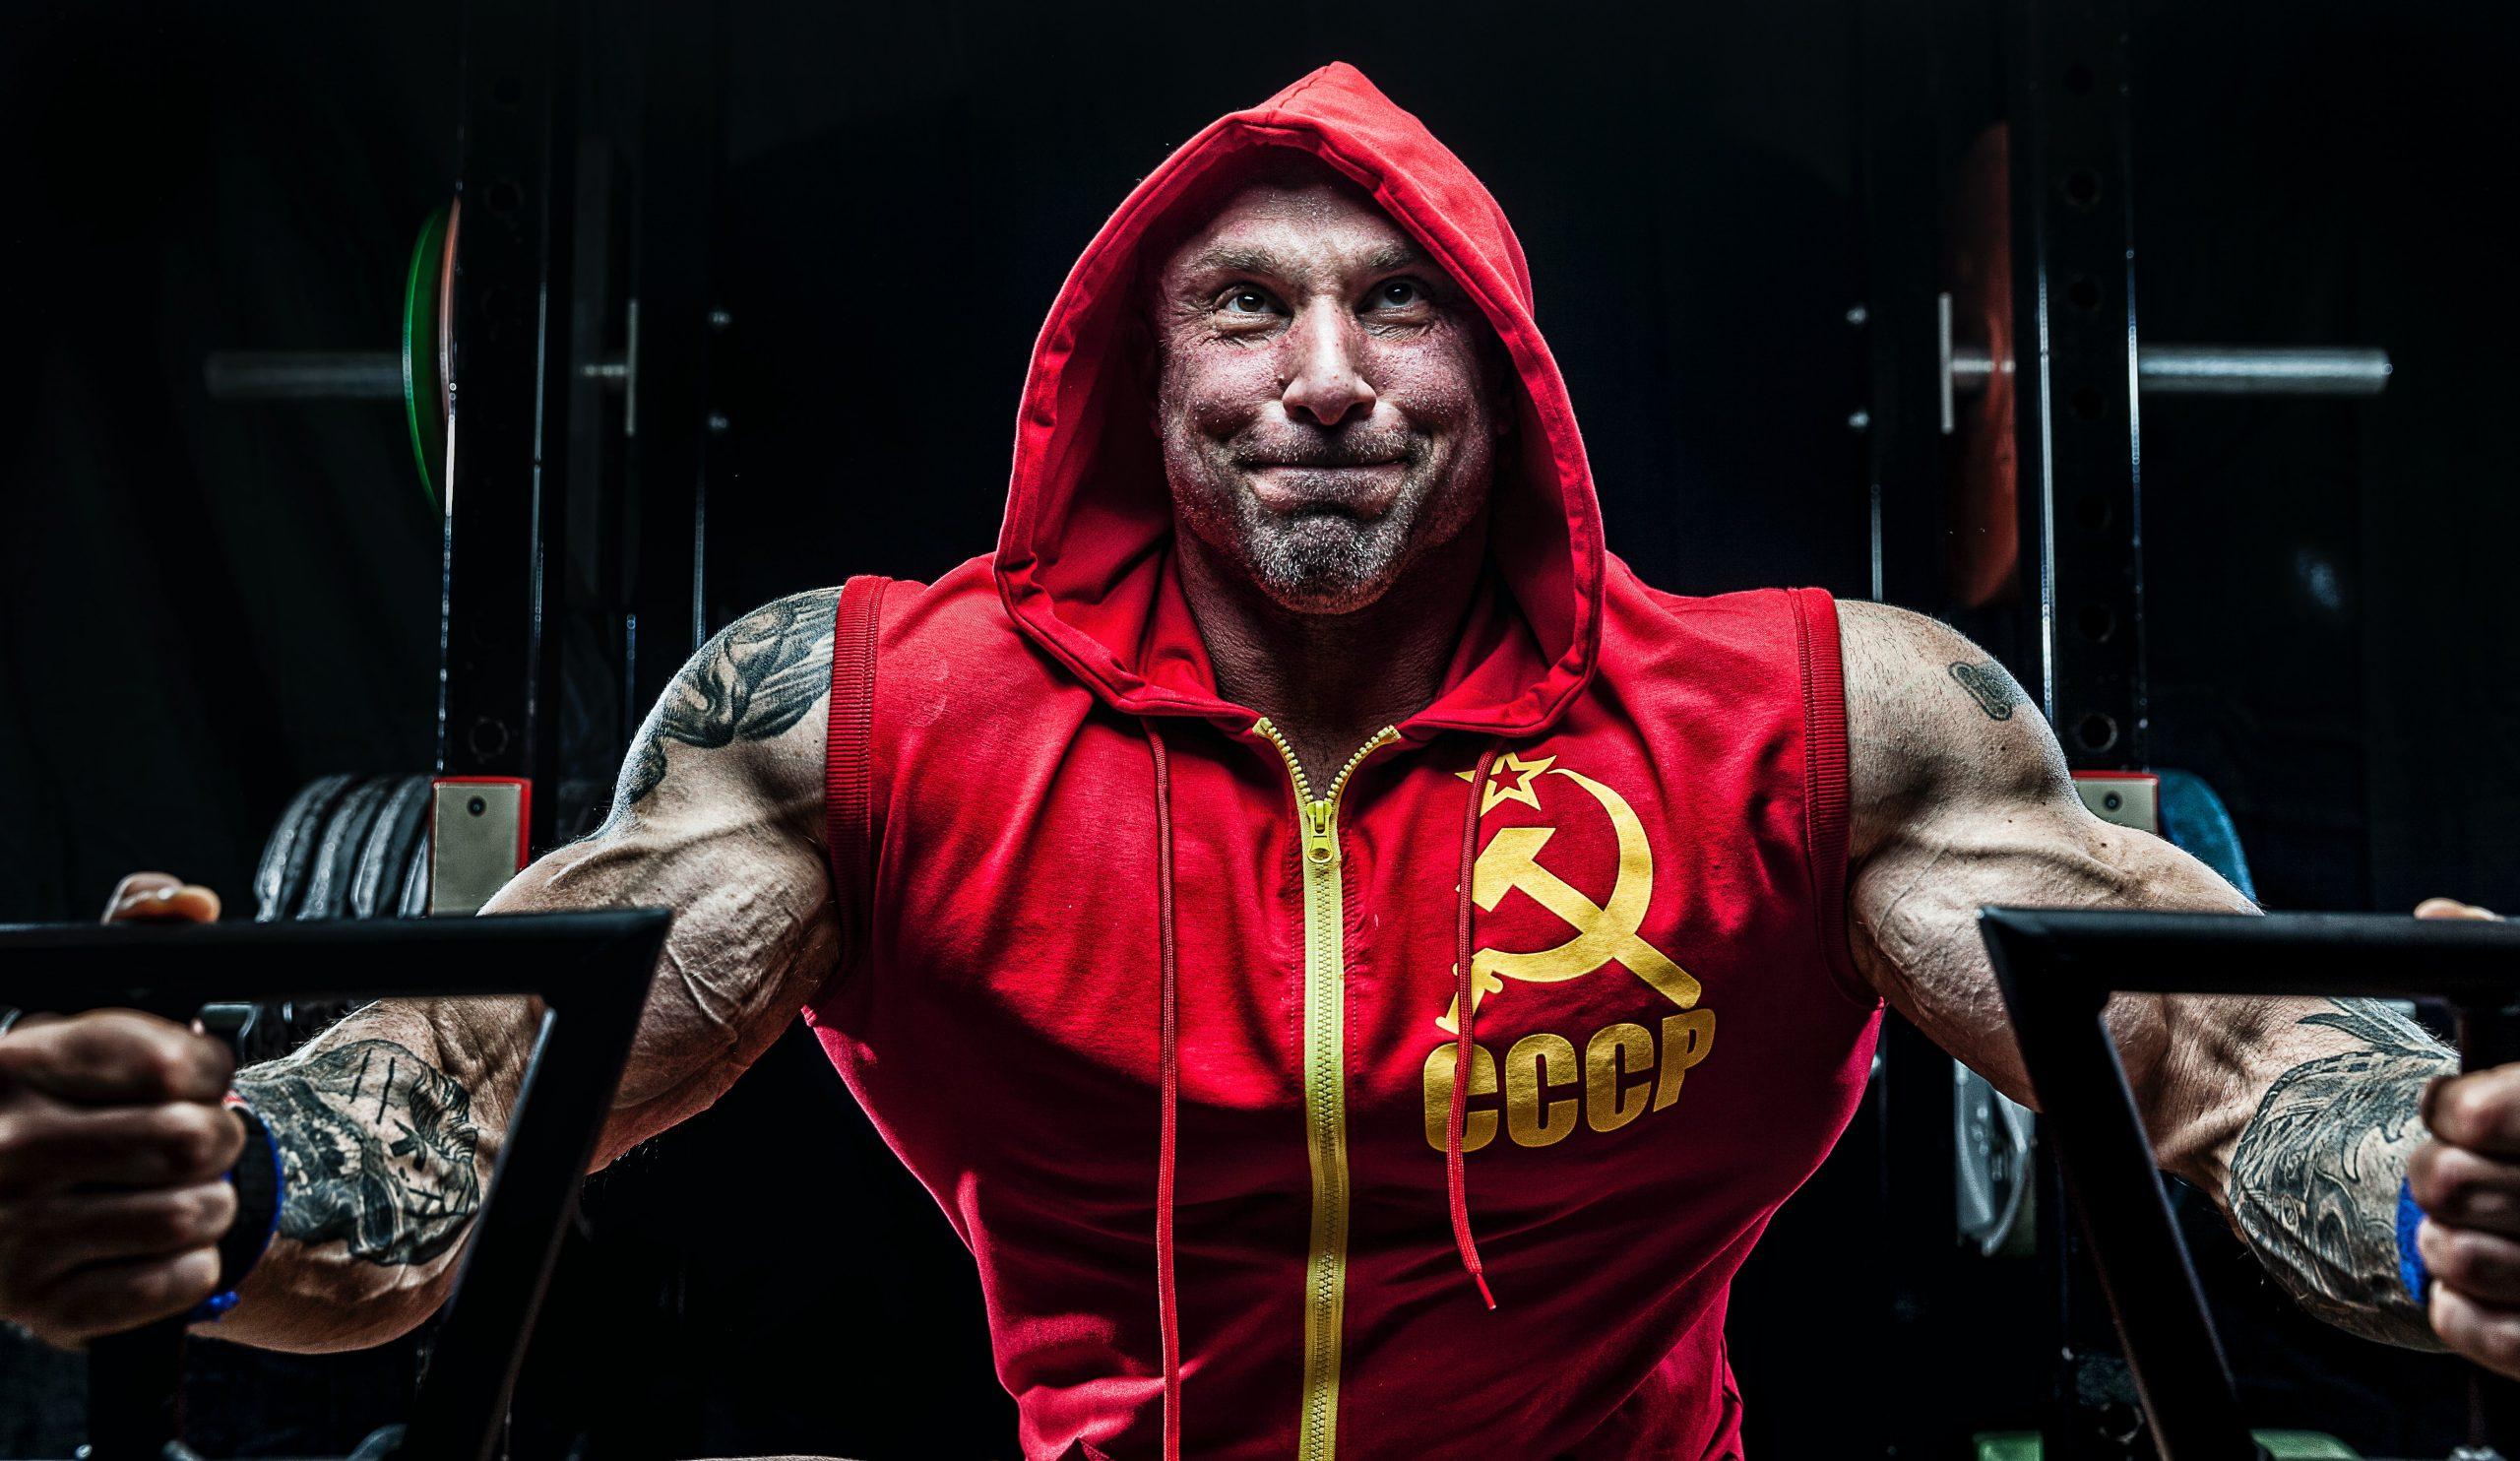 biceps-ovningar-2020